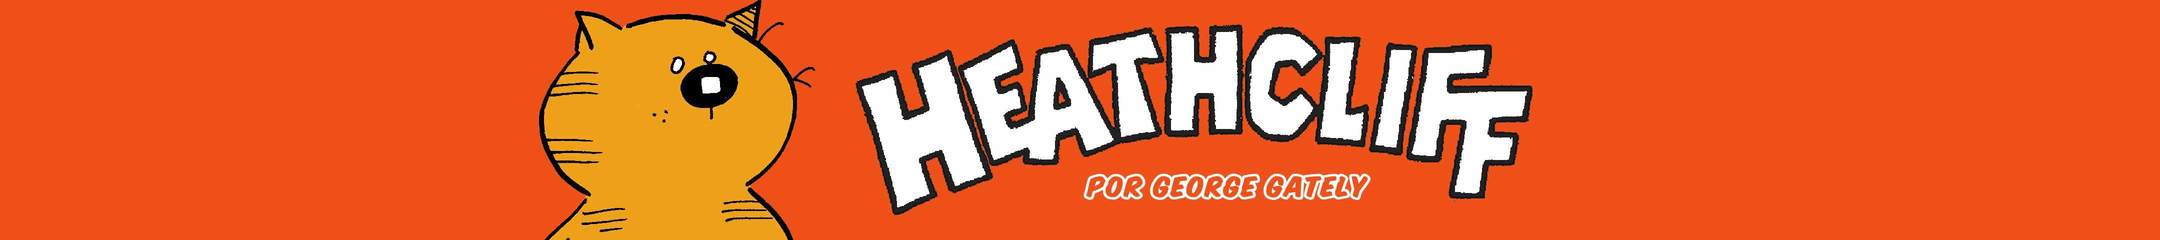 Heathcliff en Español